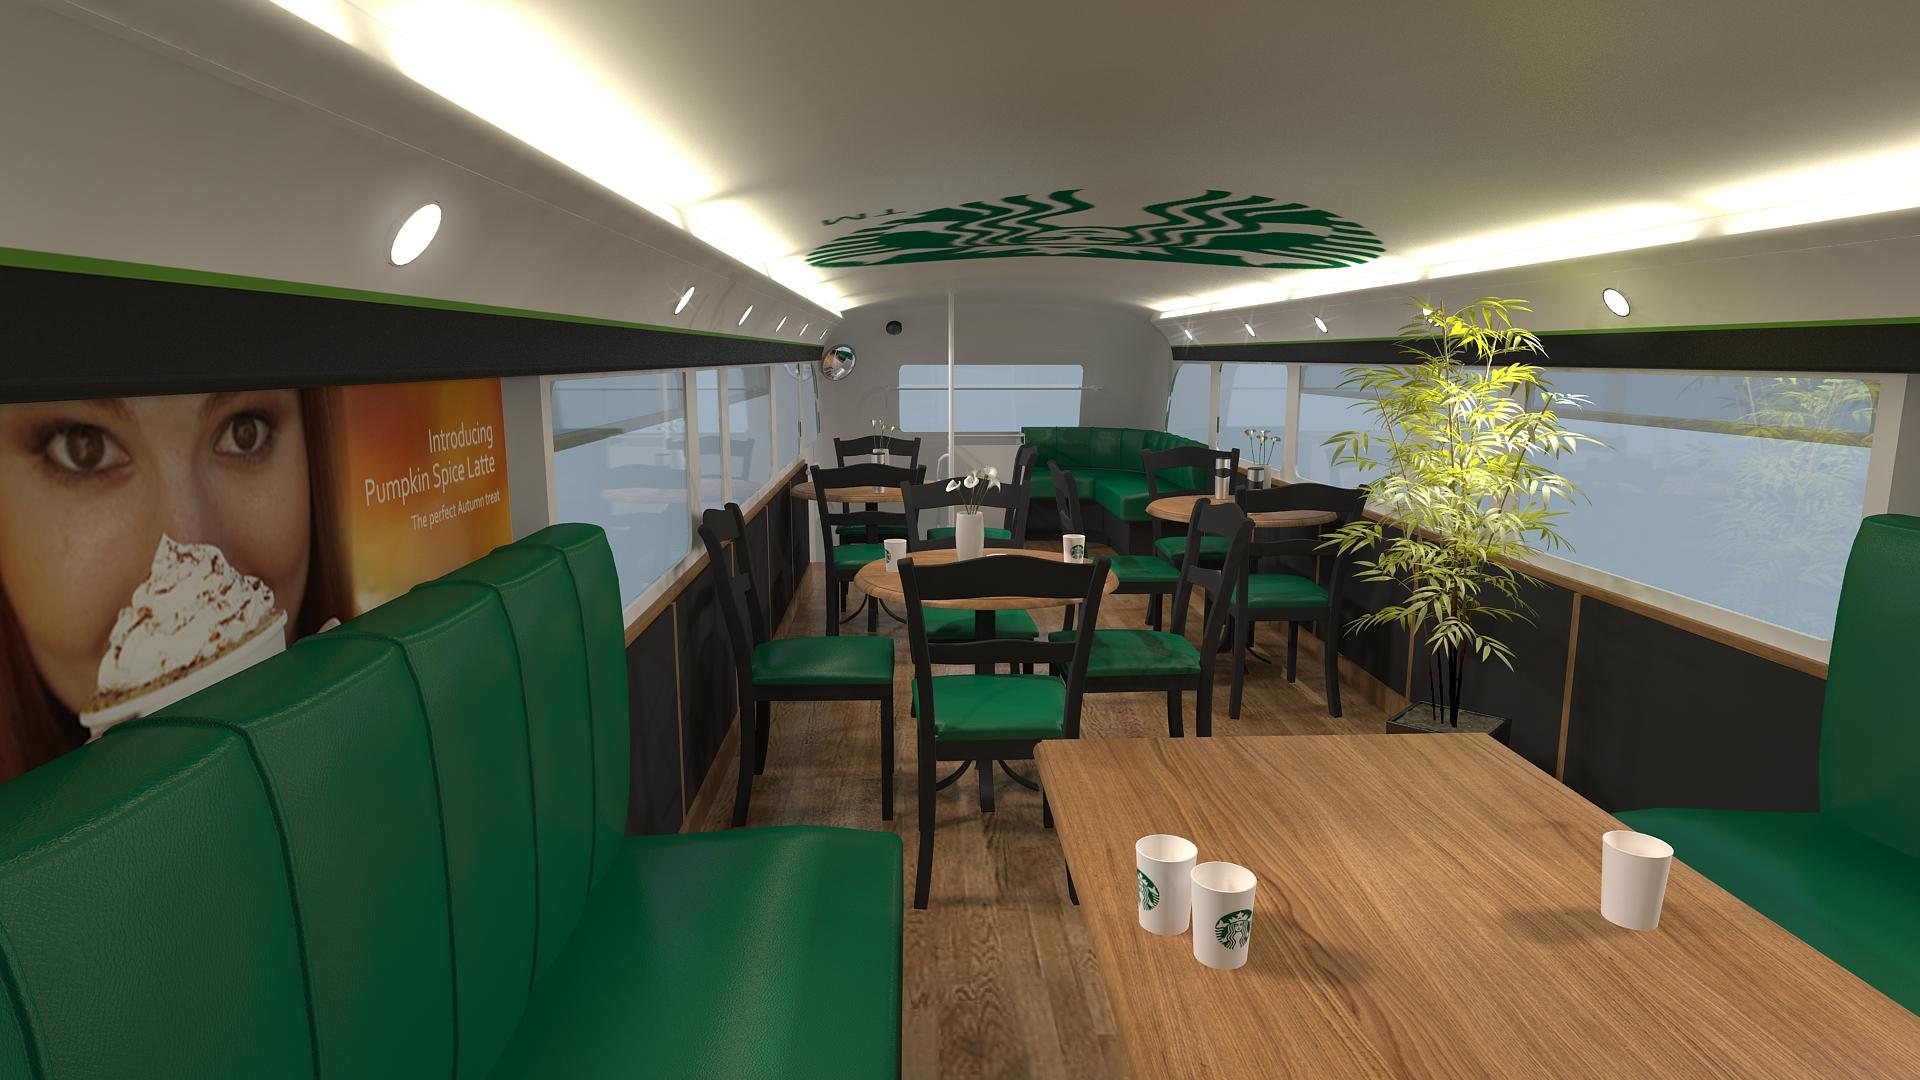 Starbucks Top Deck from Front_02.jpg